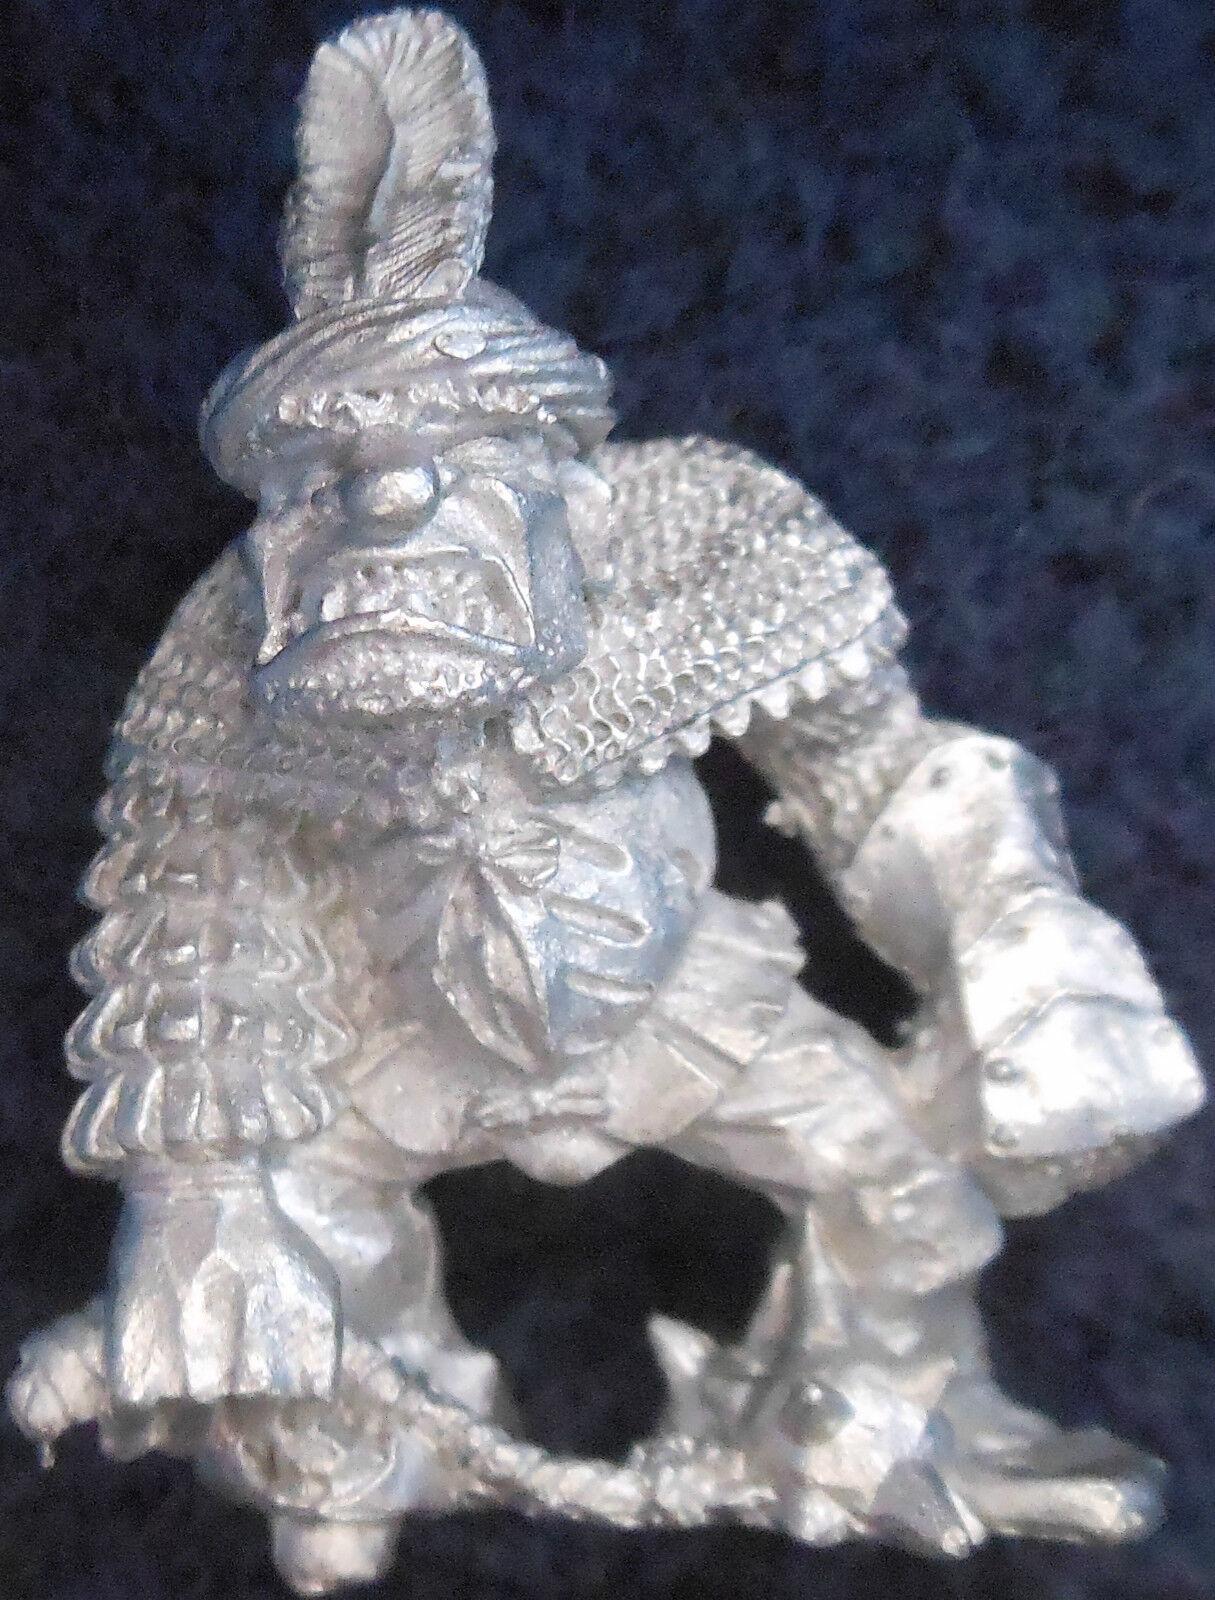 1990 Marauder Ogre MM41 5 A Warhammer Army Citadel Kingdoms Mercenary Bulls Ogor